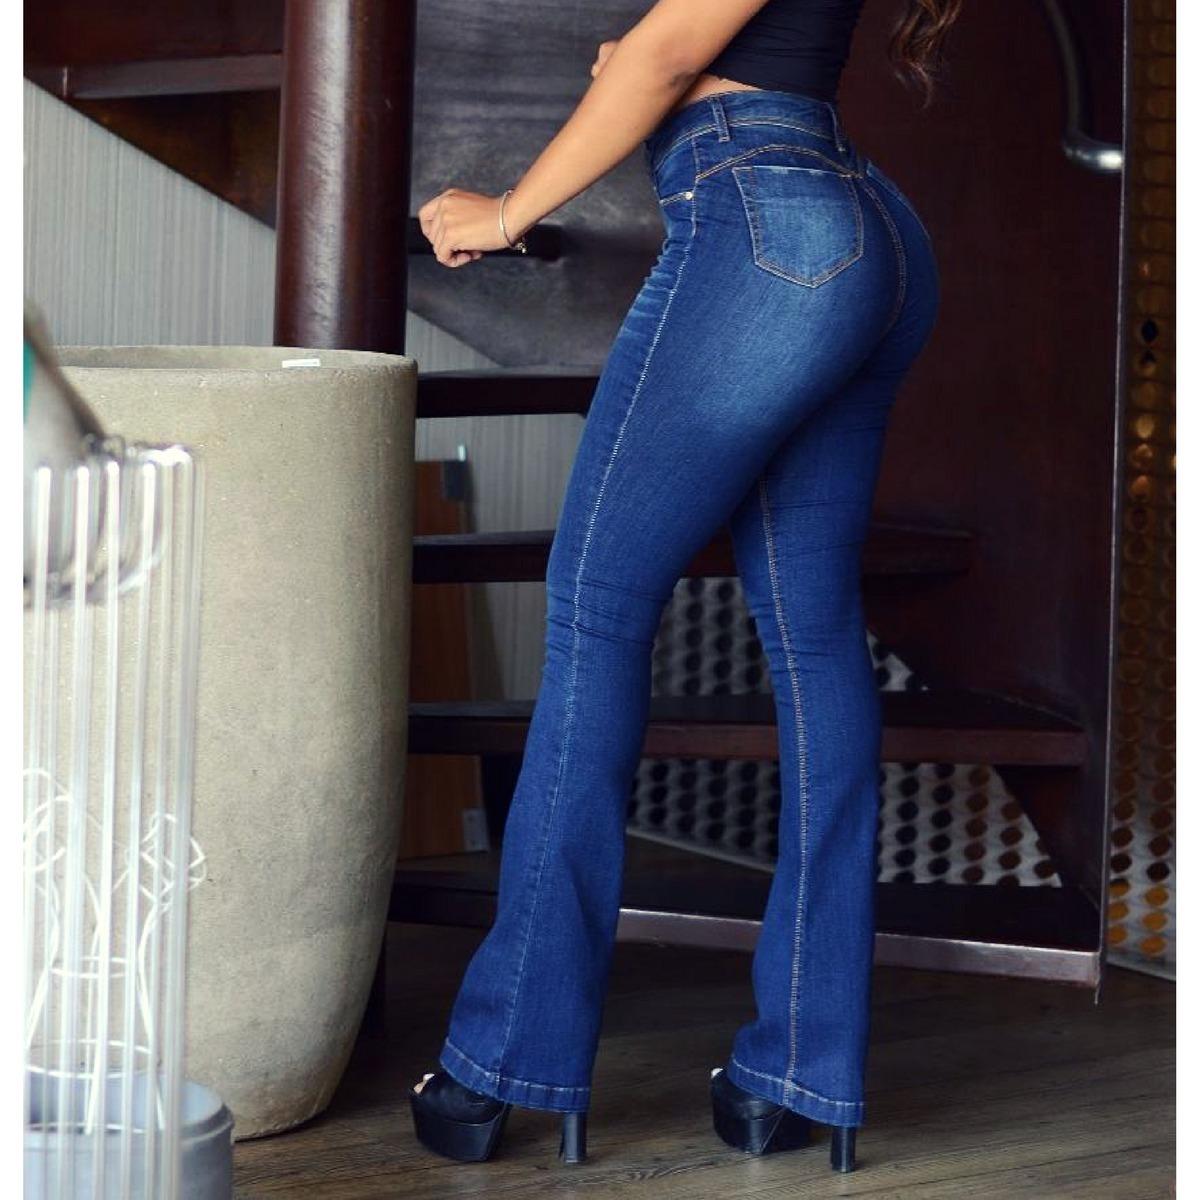 calça jeans feminina flare levanta bumbum cintura alta dins. Carregando  zoom. 21f2deae882